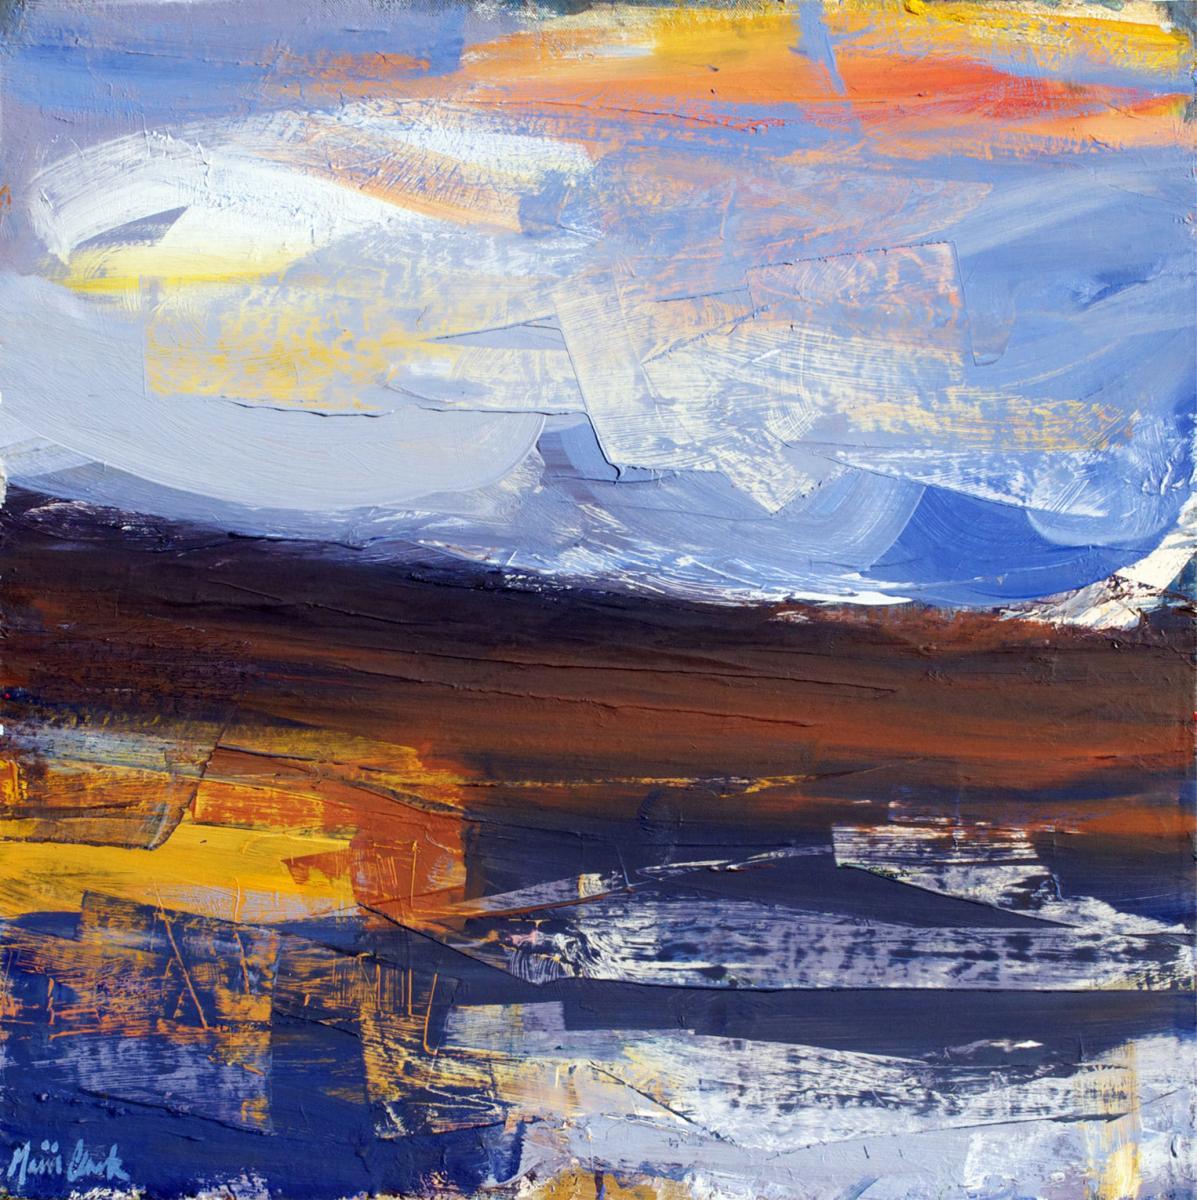 'Sunlit Sky, North West Sutherland' by Mairi Clark